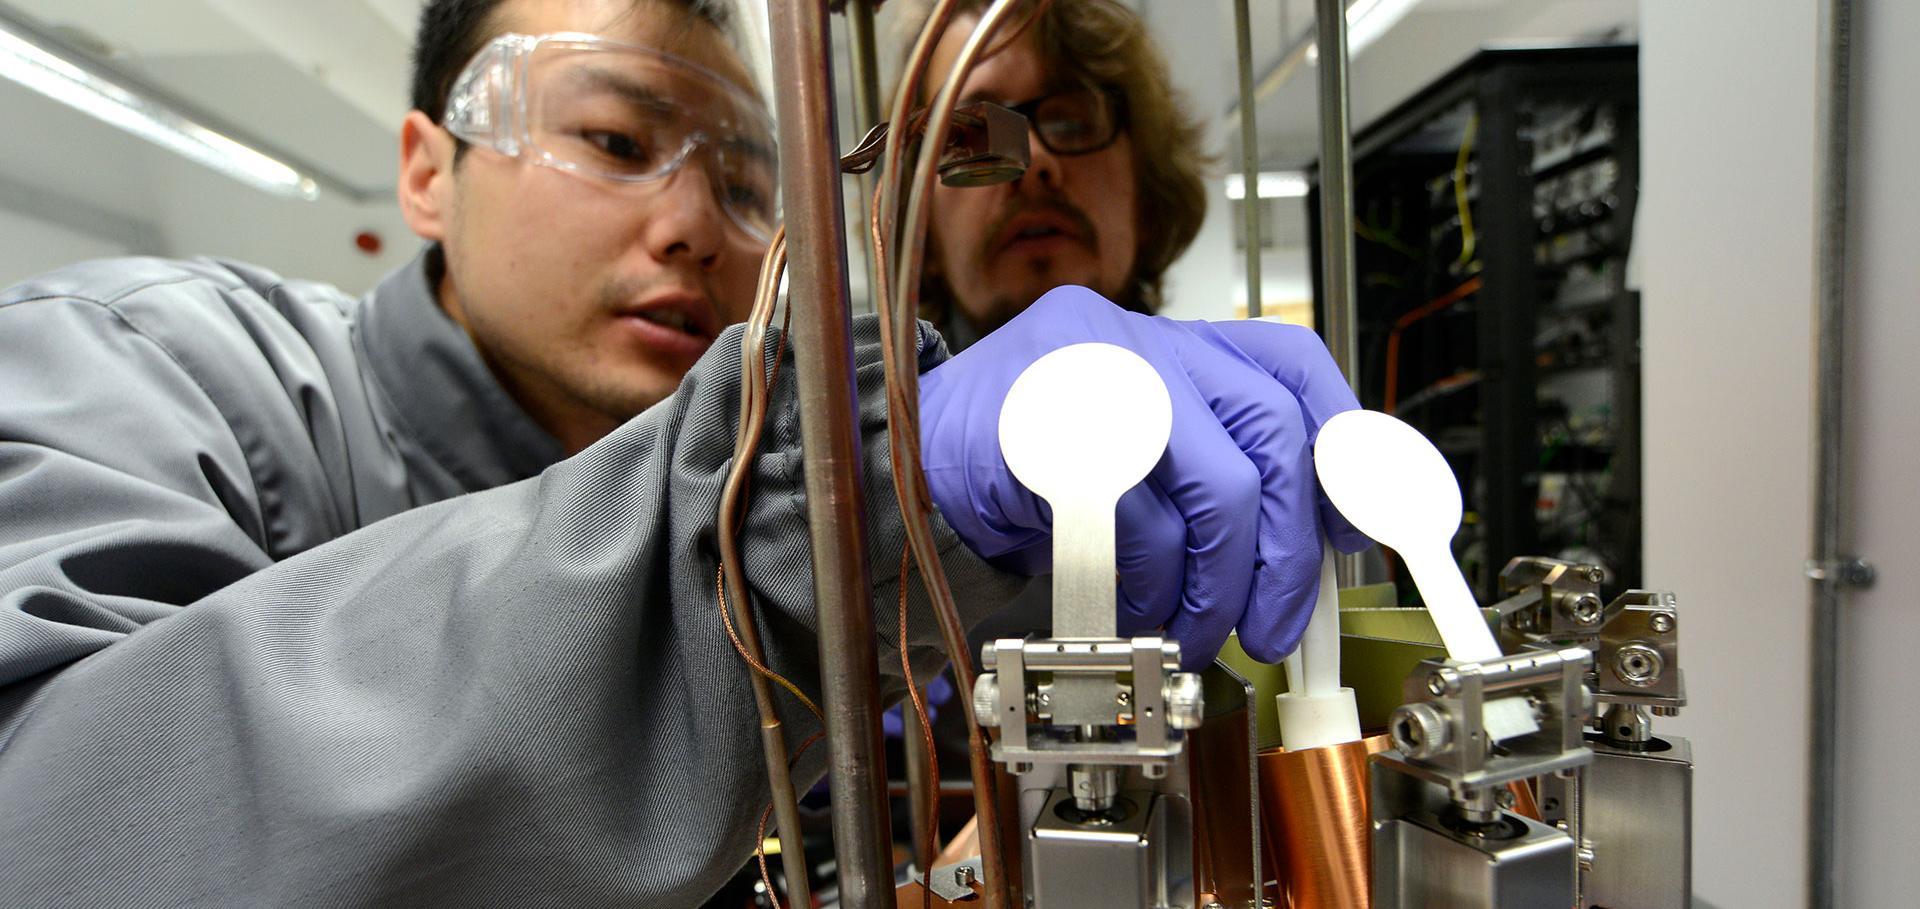 Man with scientific instruments